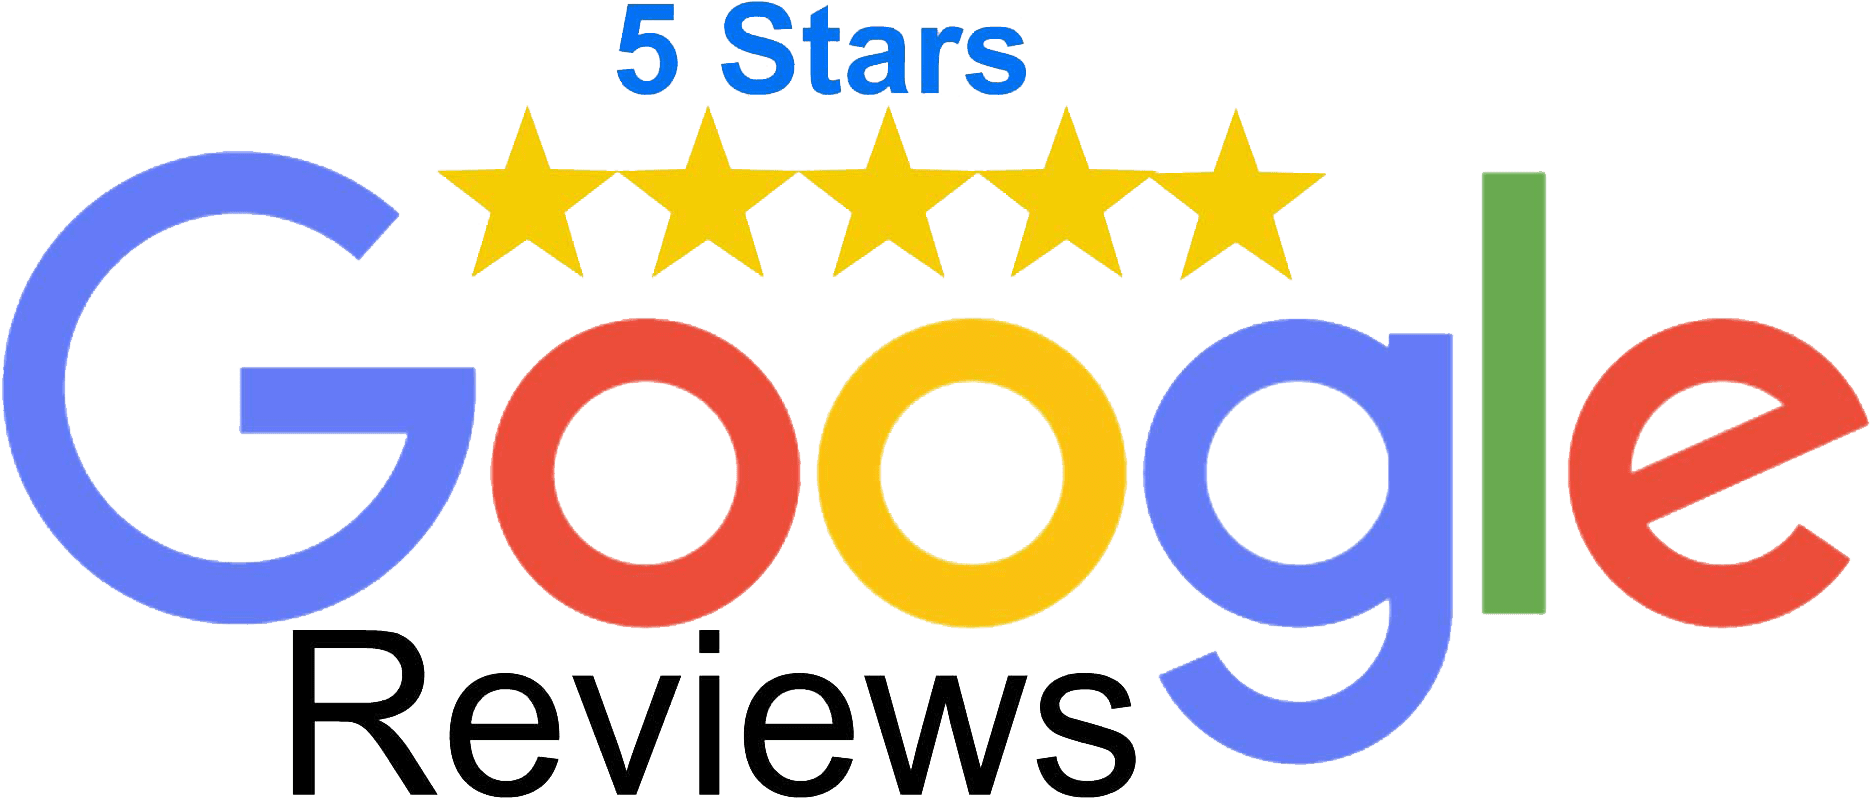 toppng.com 5 star google reviews google review 5 stars 1870x798 1